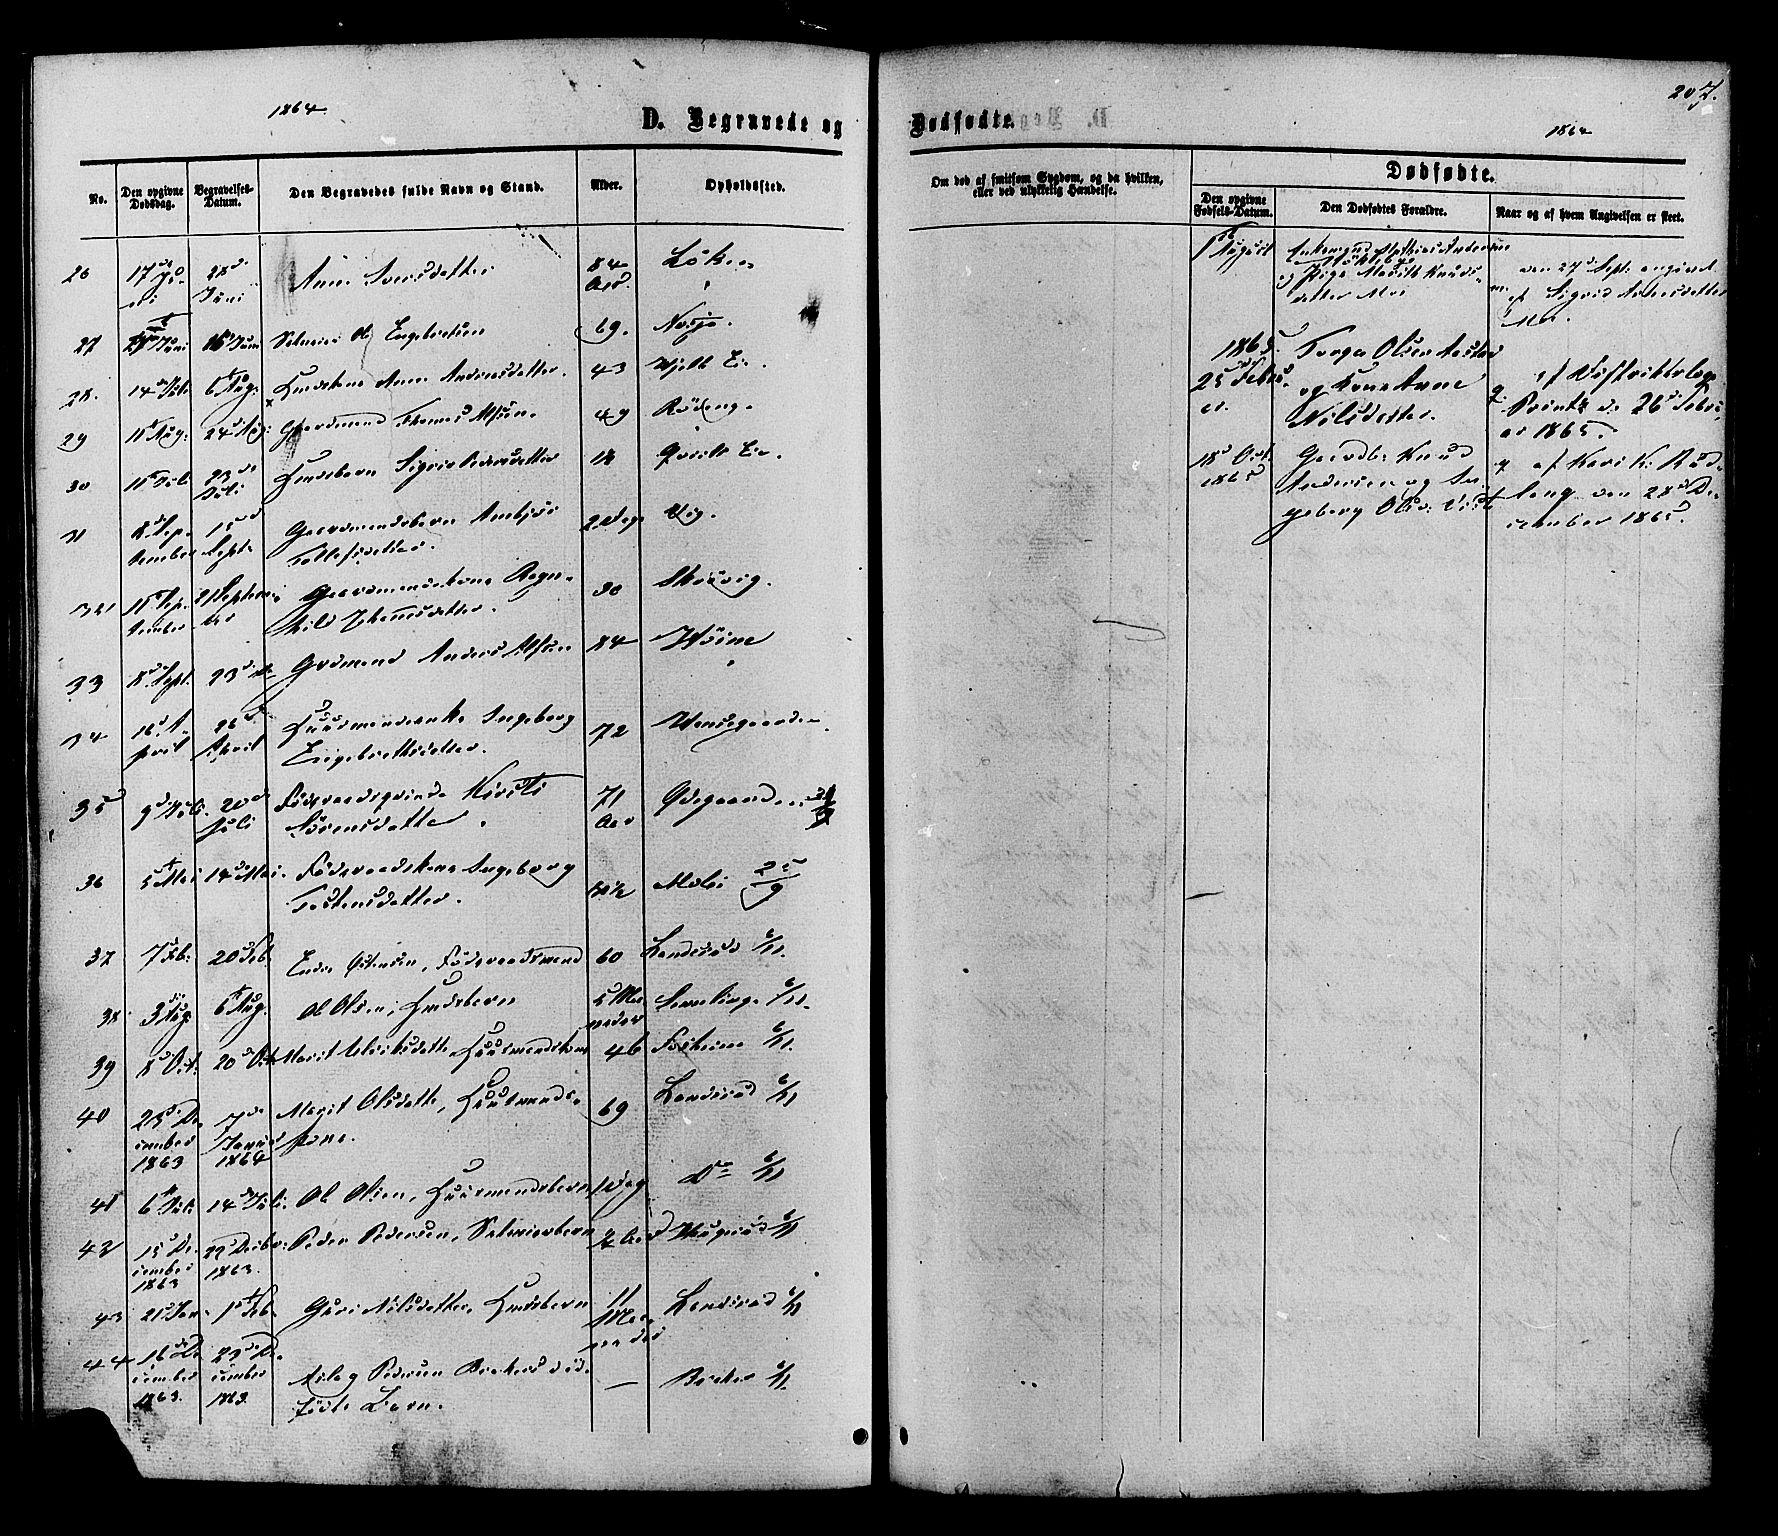 SAH, Vestre Slidre prestekontor, Ministerialbok nr. 3, 1865-1880, s. 207